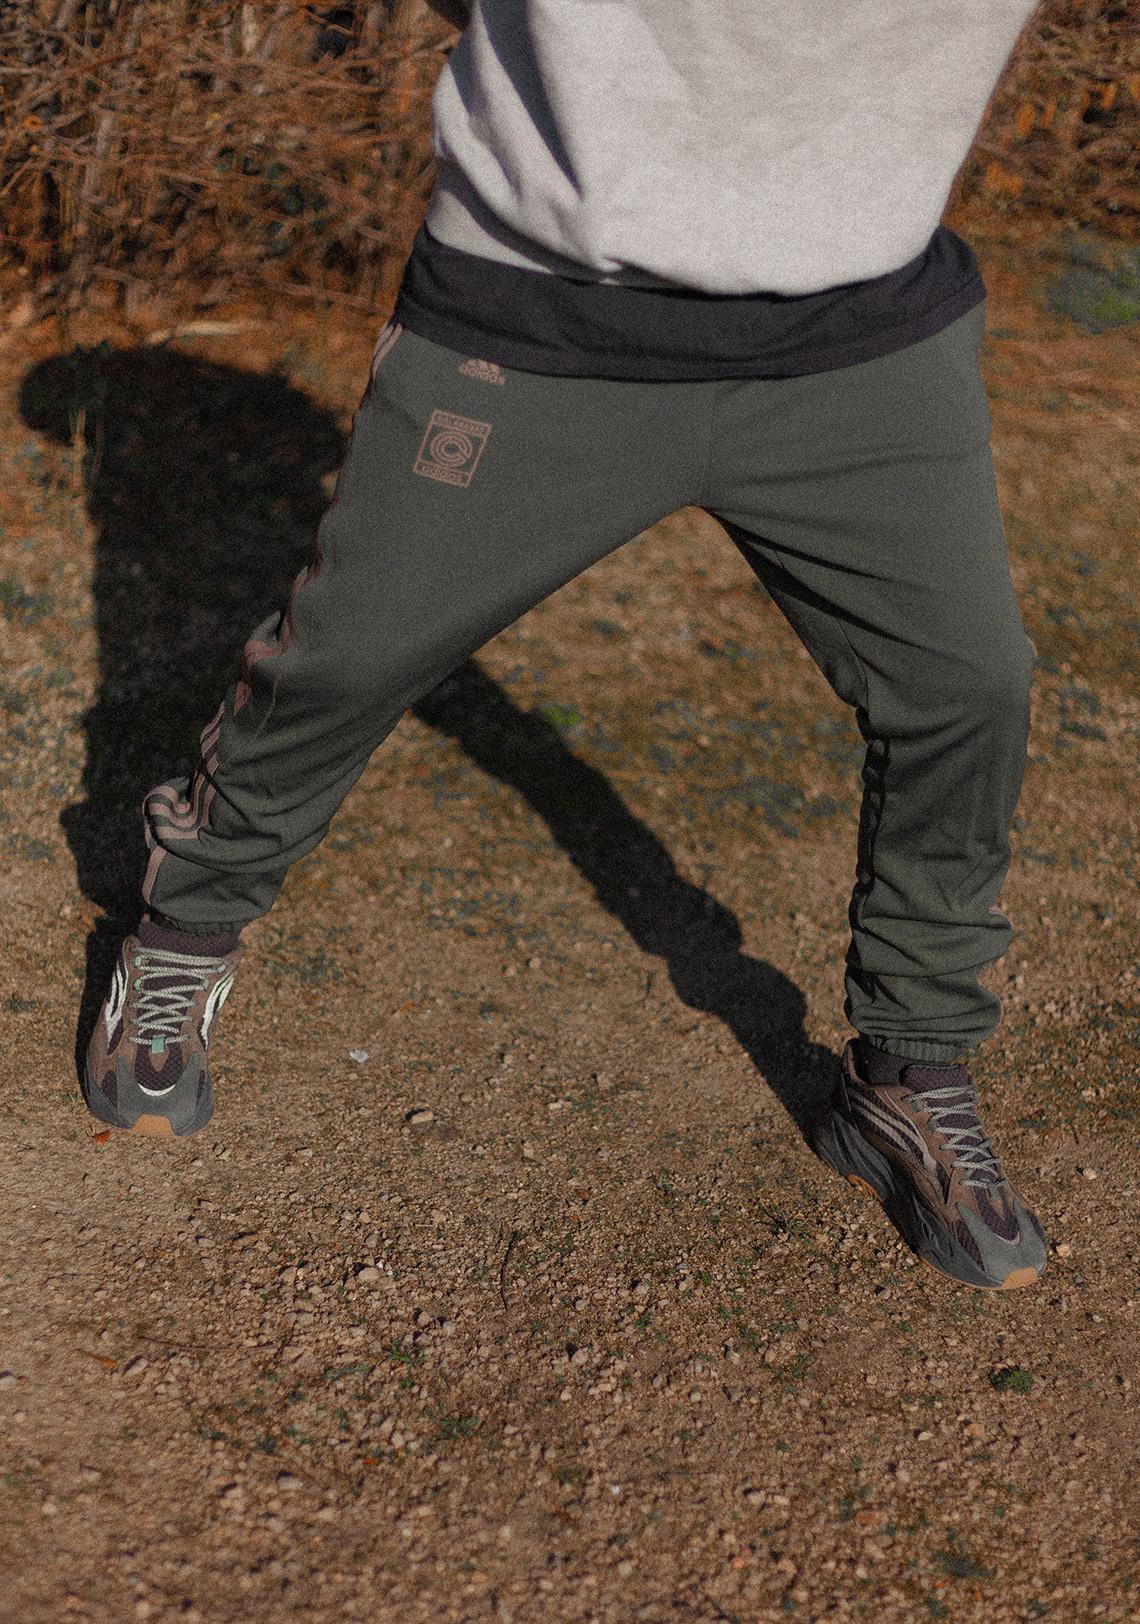 004482ef32d39 adidas Yeezy 700 v2